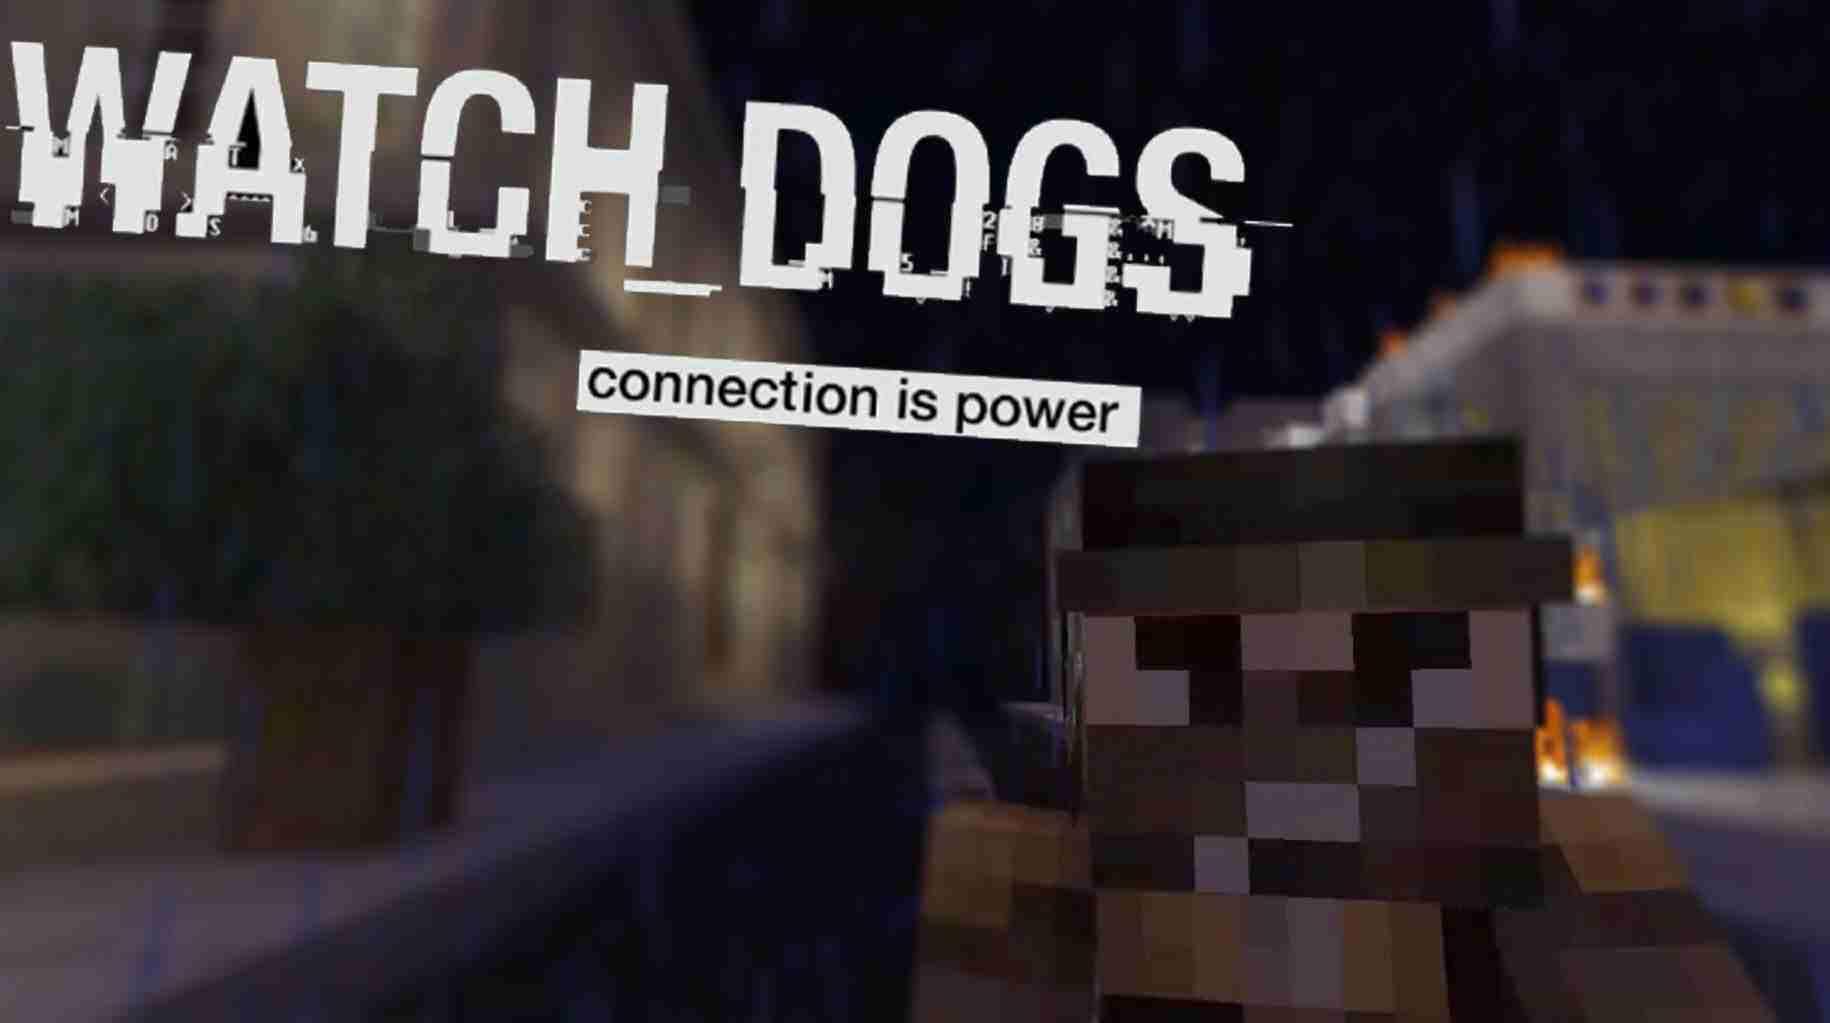 atch dogs